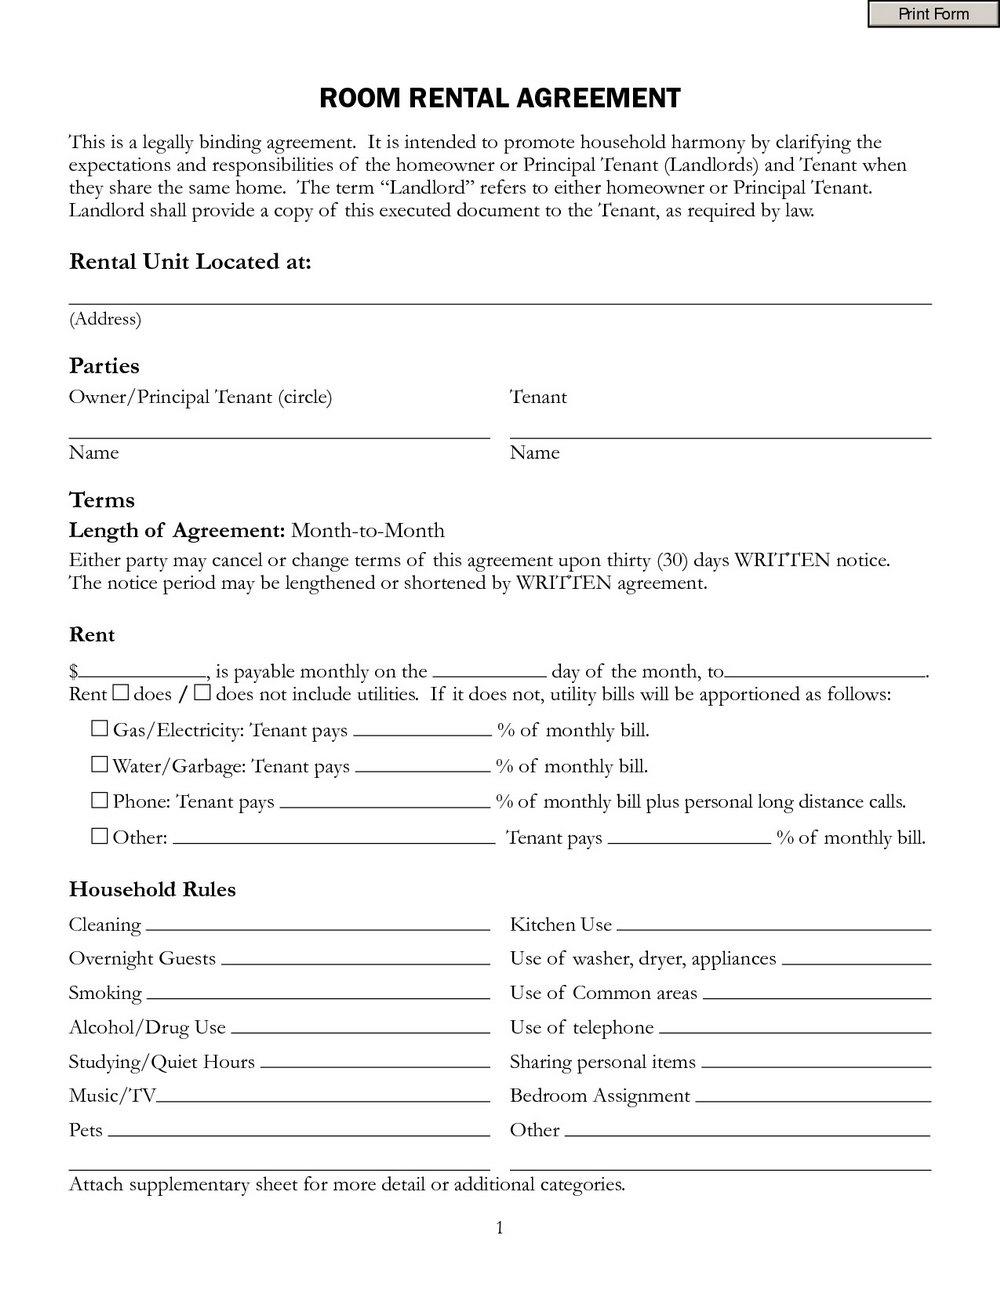 Free Room Rental Agreement Template Word